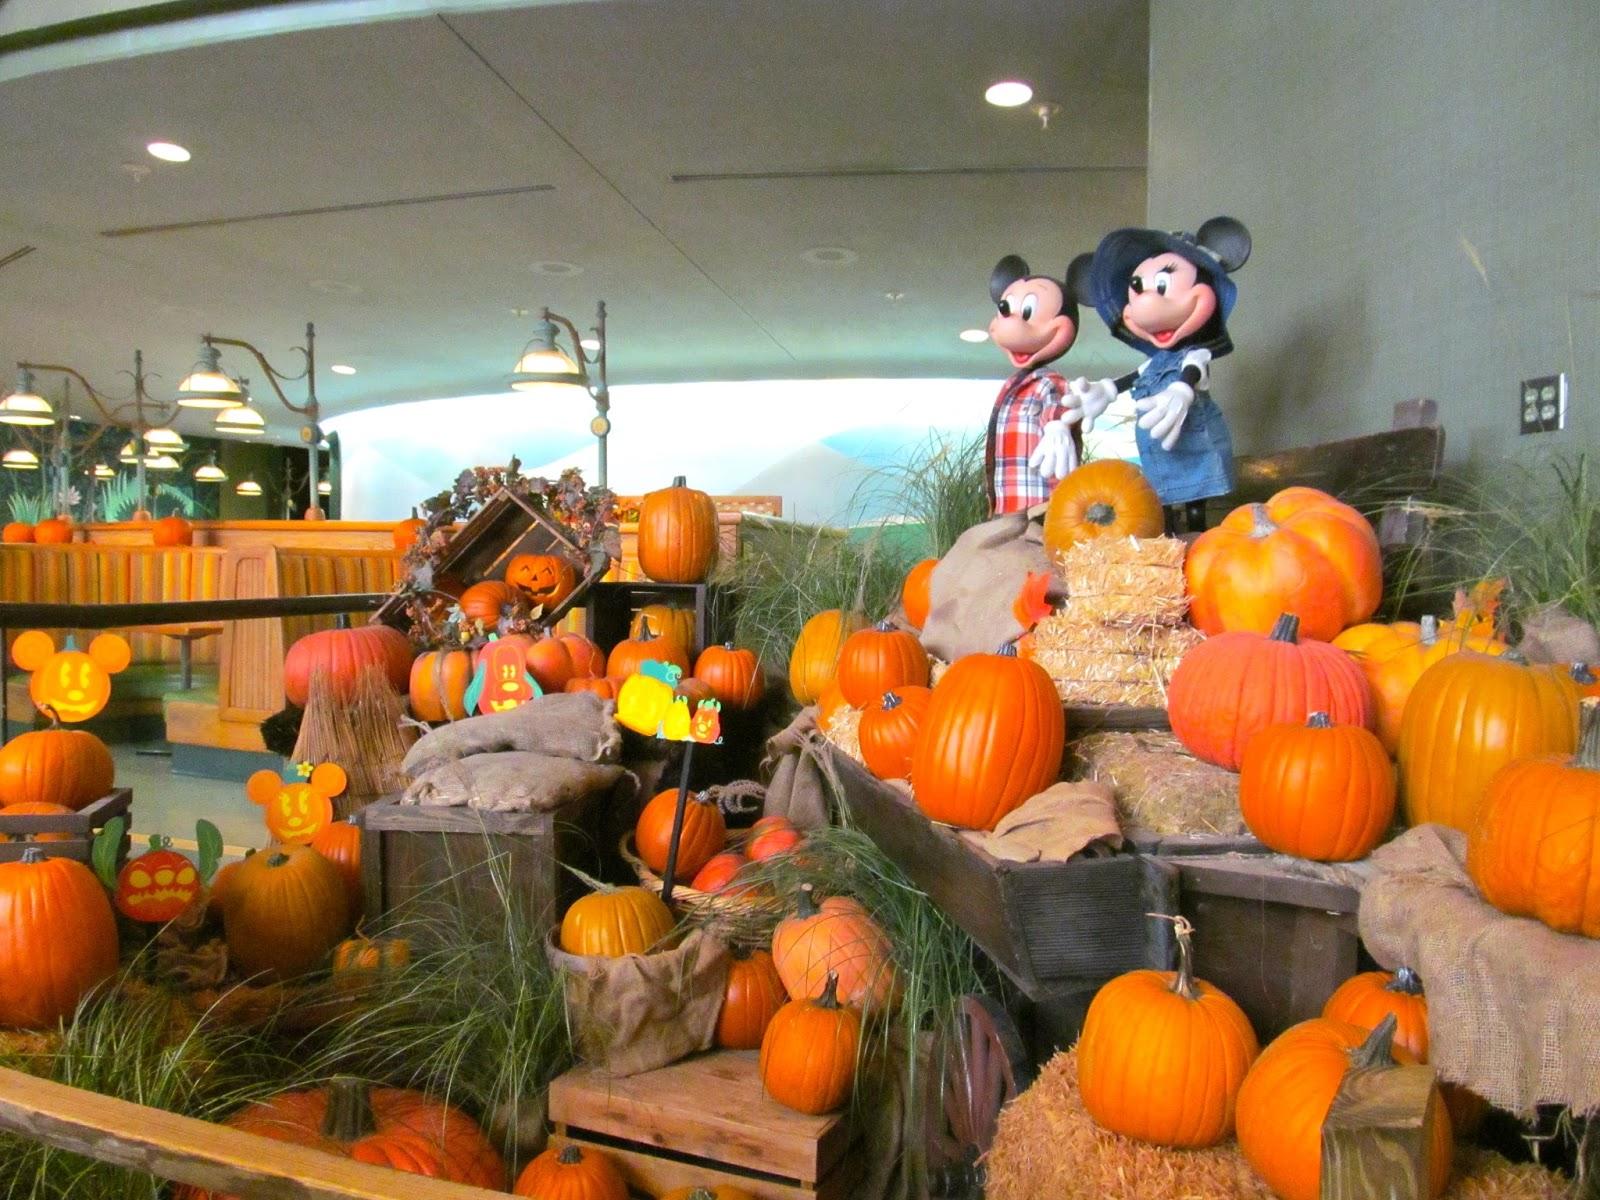 Fall at the Land Pavillion in Epcot at the Walt Disney World Resort - Orlando, FL - Ouroutdoortravels.blogspot.com